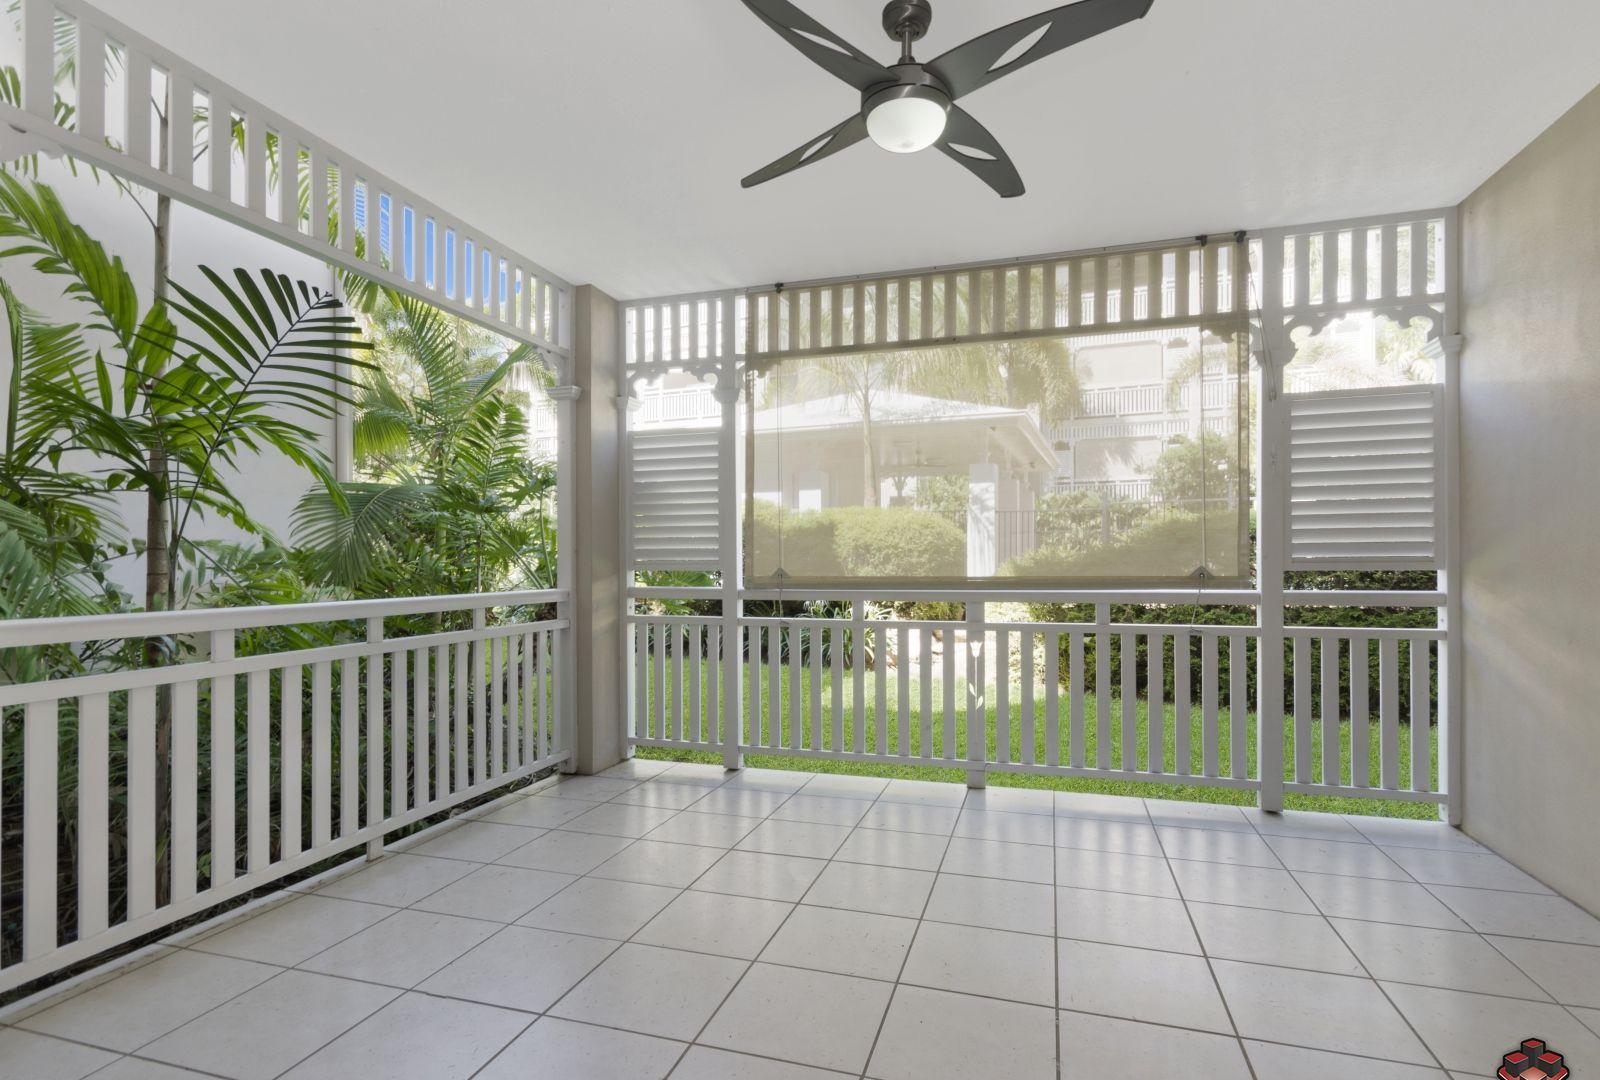 3/42 Warburton Street, North Ward QLD 4810, Image 1